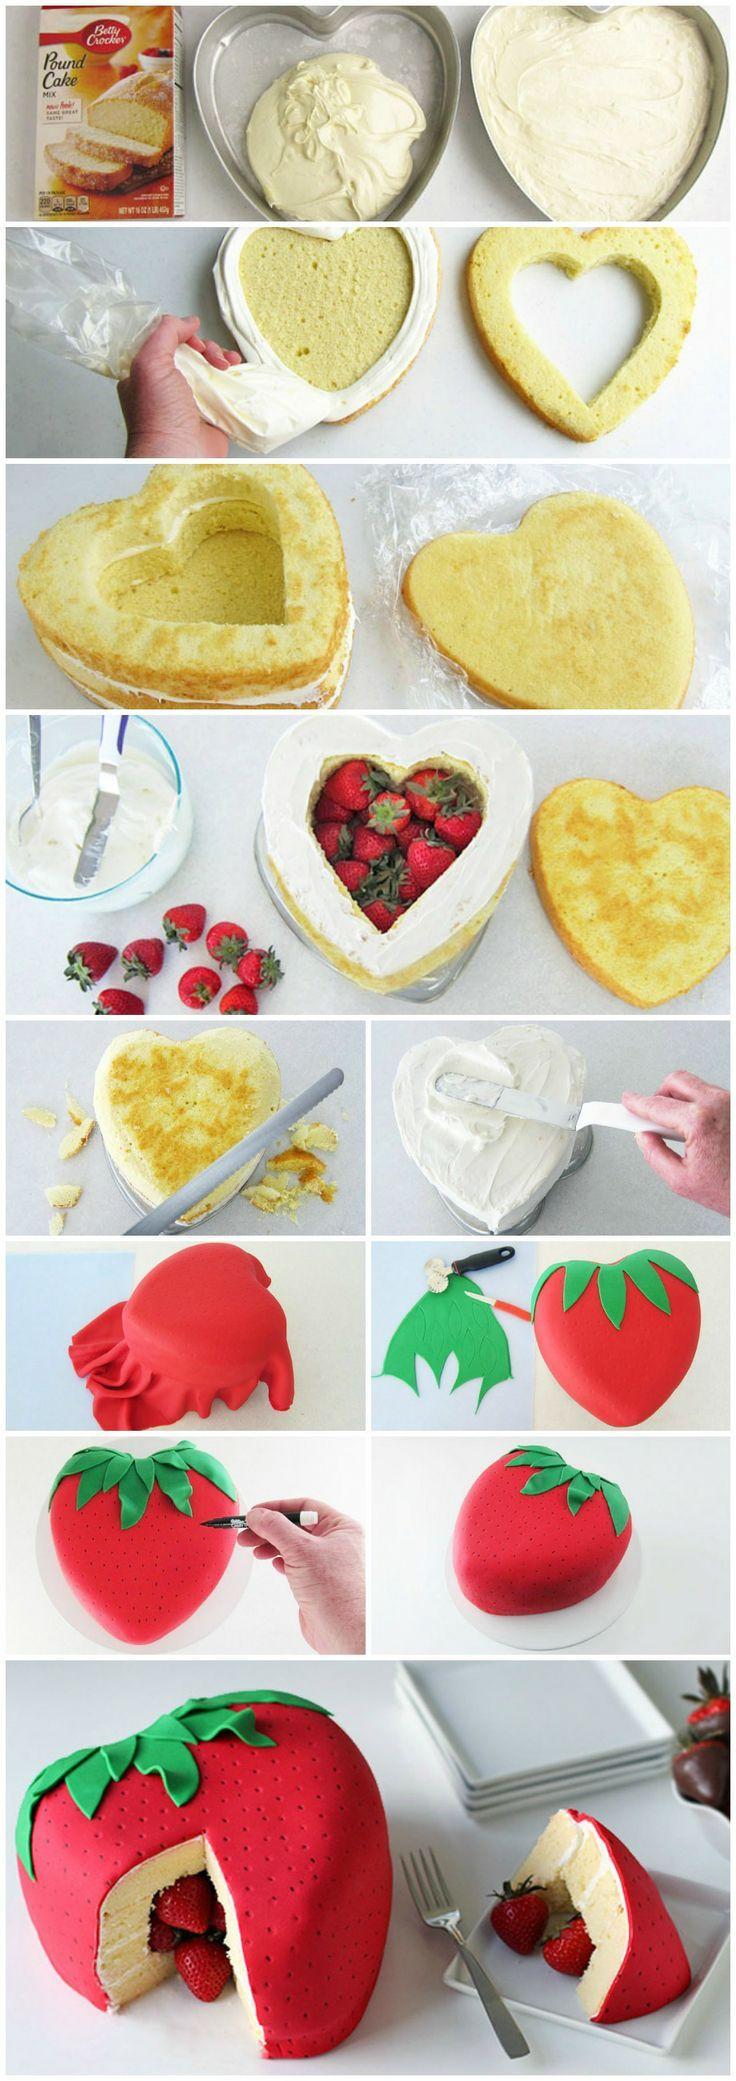 9 Photos of DIY Heart Shaped Cakes Pinterest